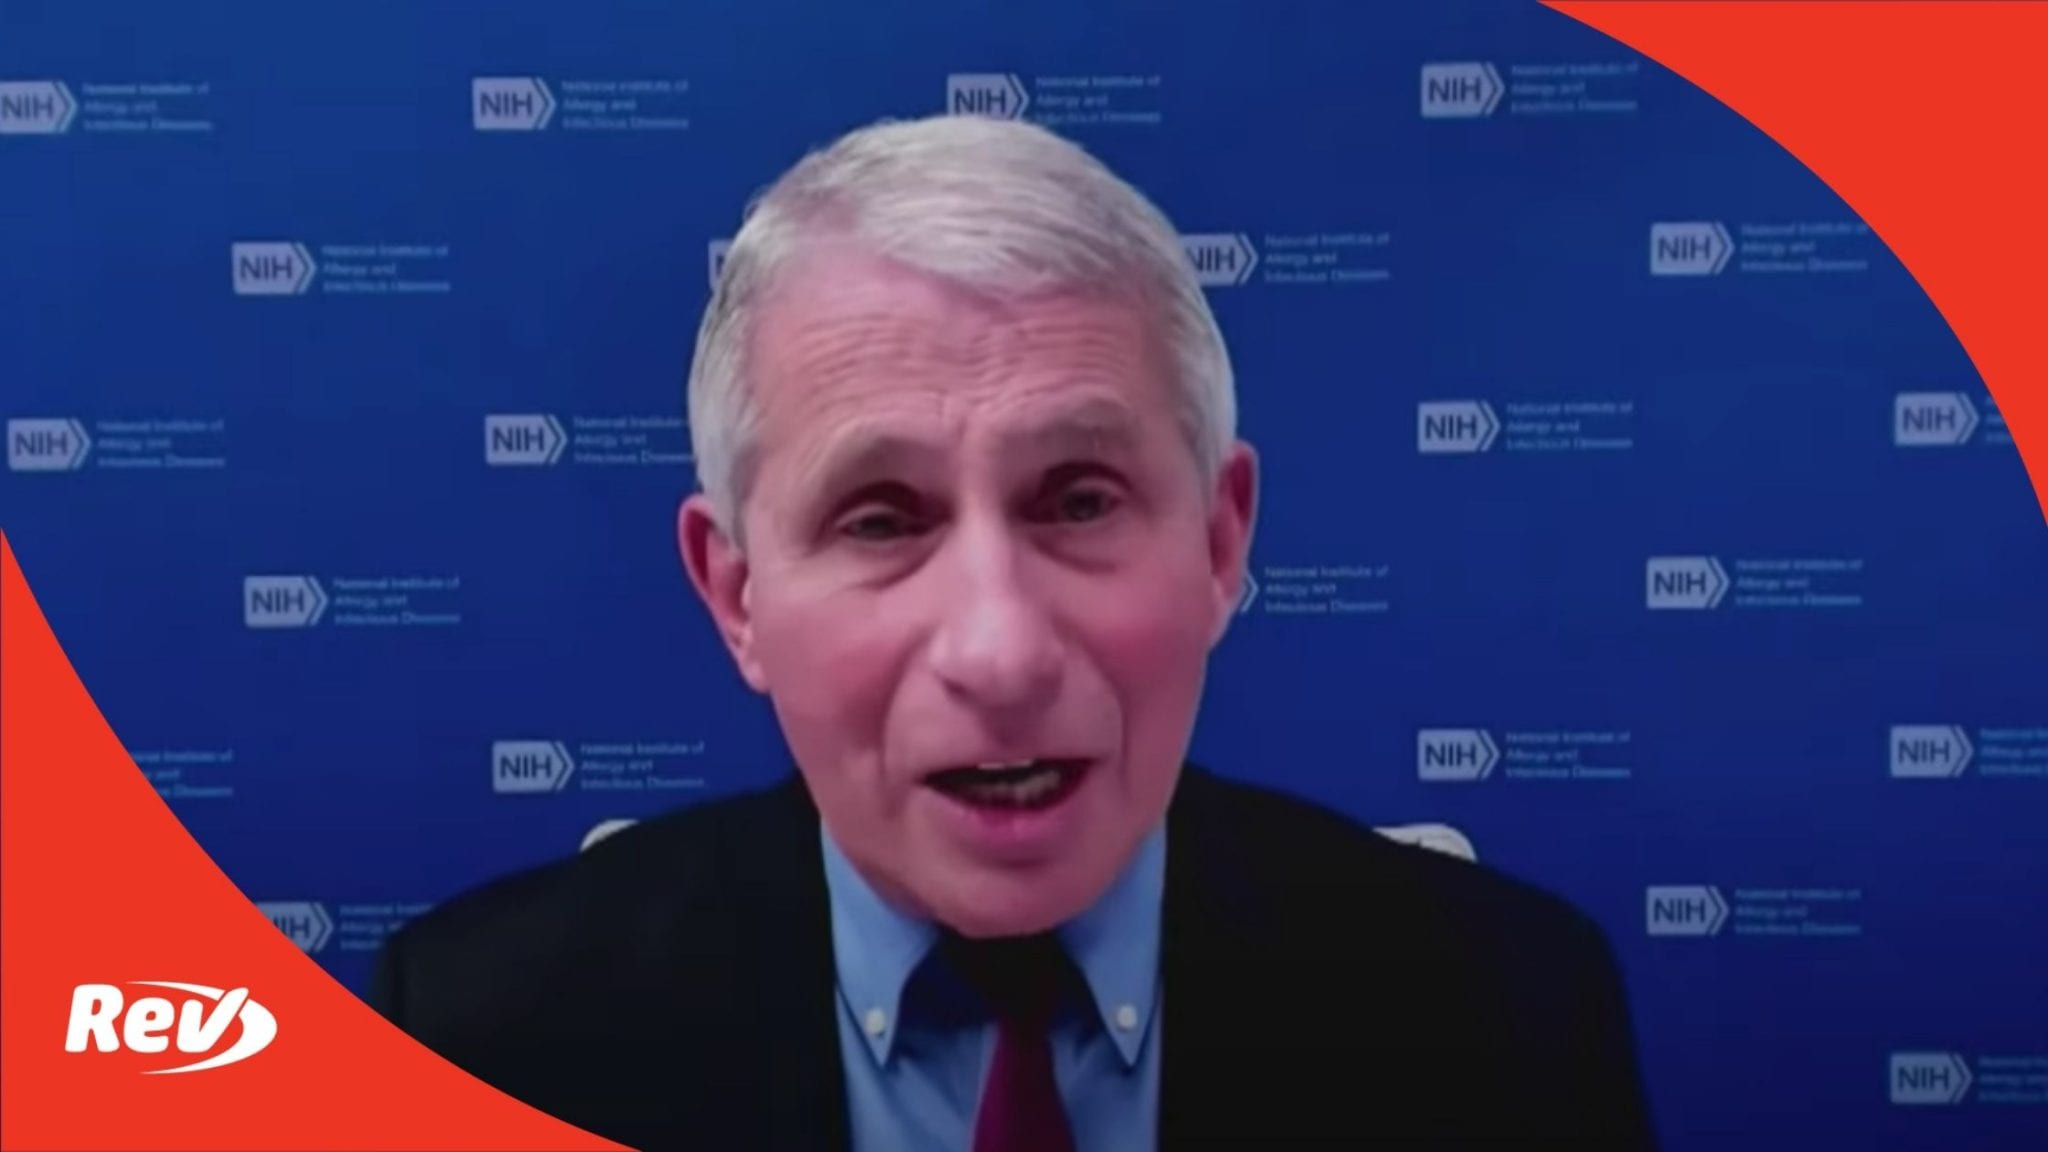 White House COVID-19 Task Force, Dr. Fauci Press Conference Transcript April 23